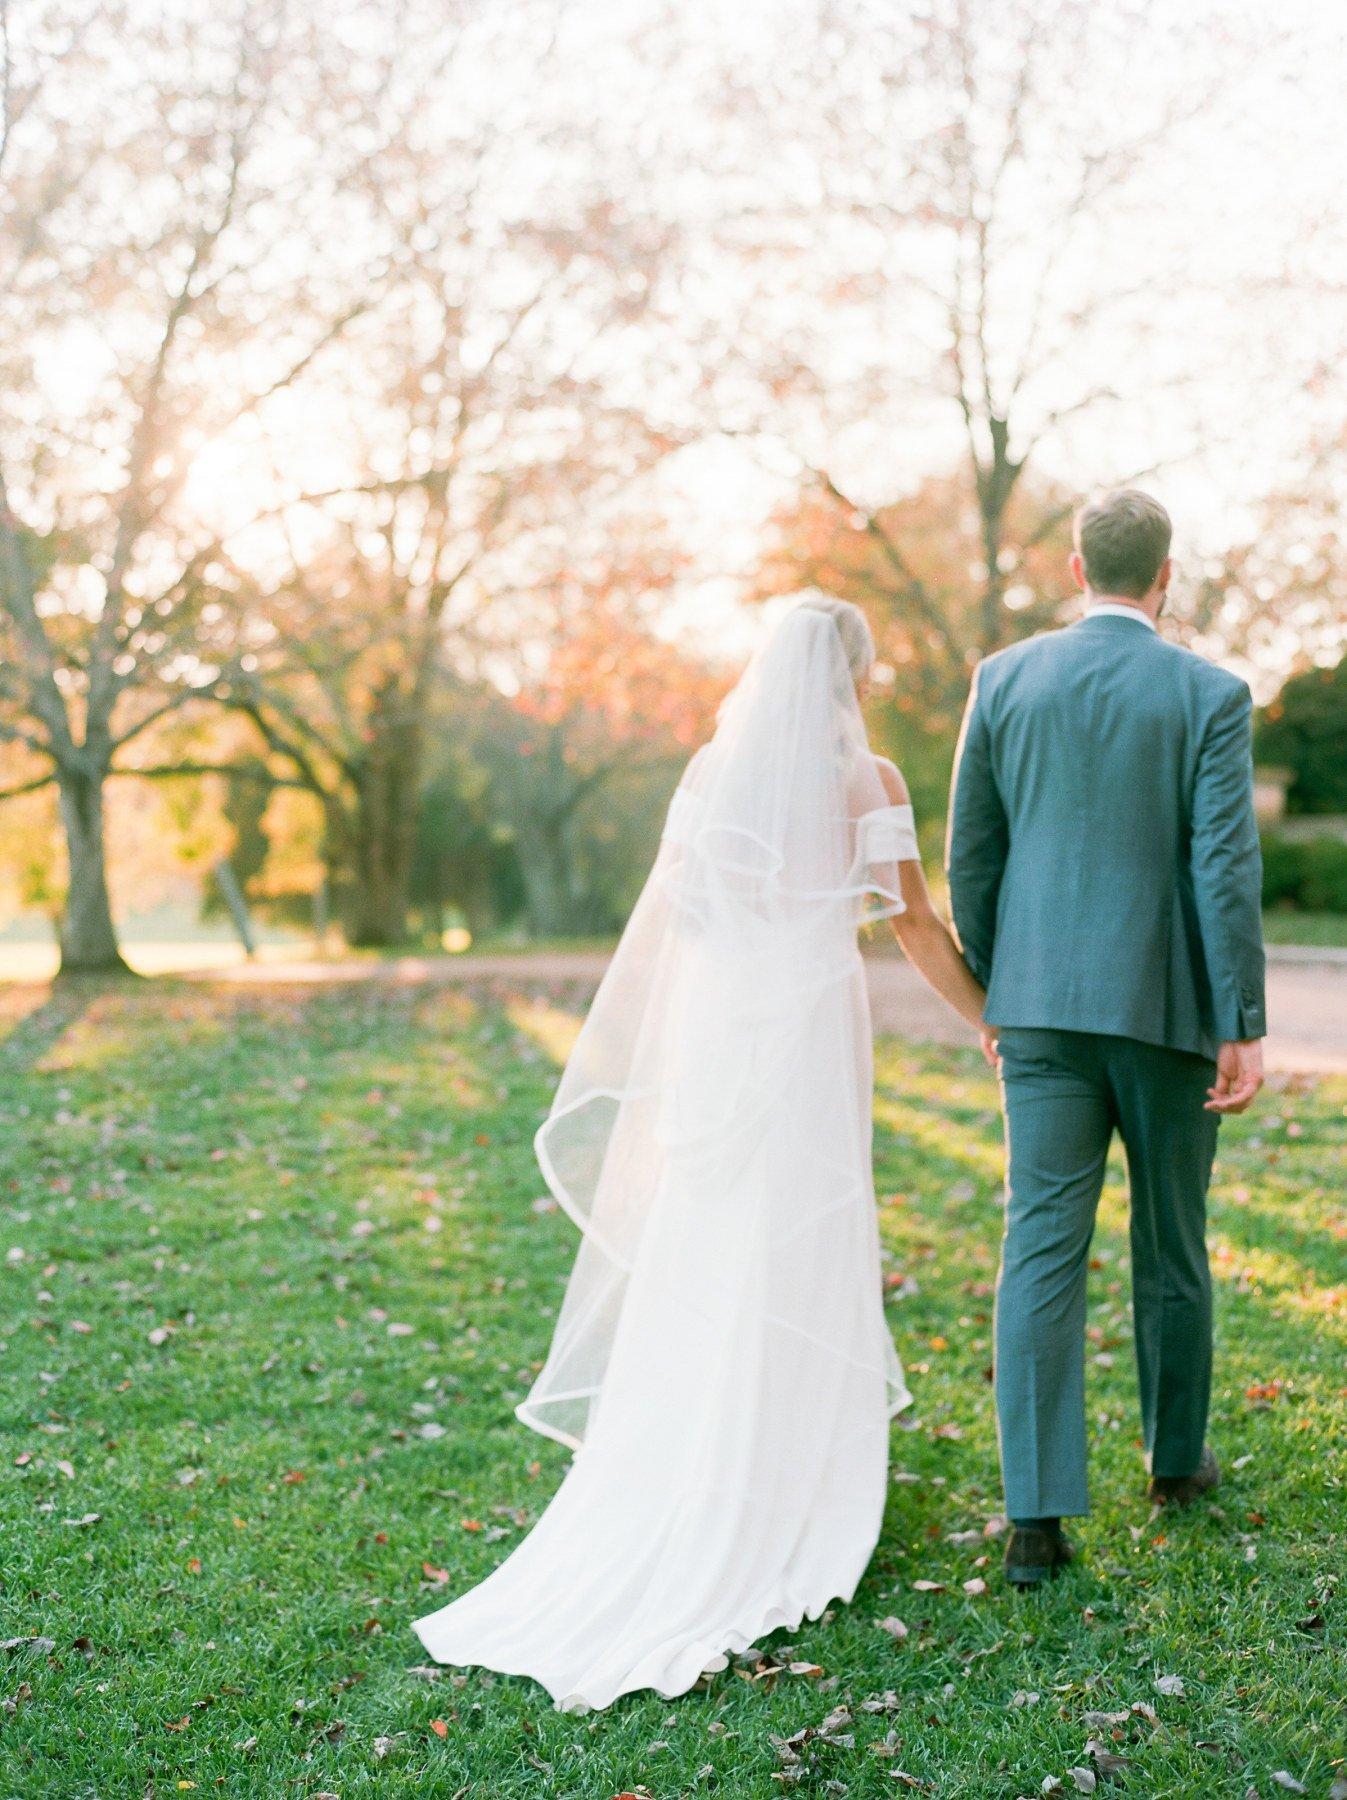 48Great_Marsh_Estates_Wedding_Anne_Kelley_Events_Astrid_Photography146486030005-2